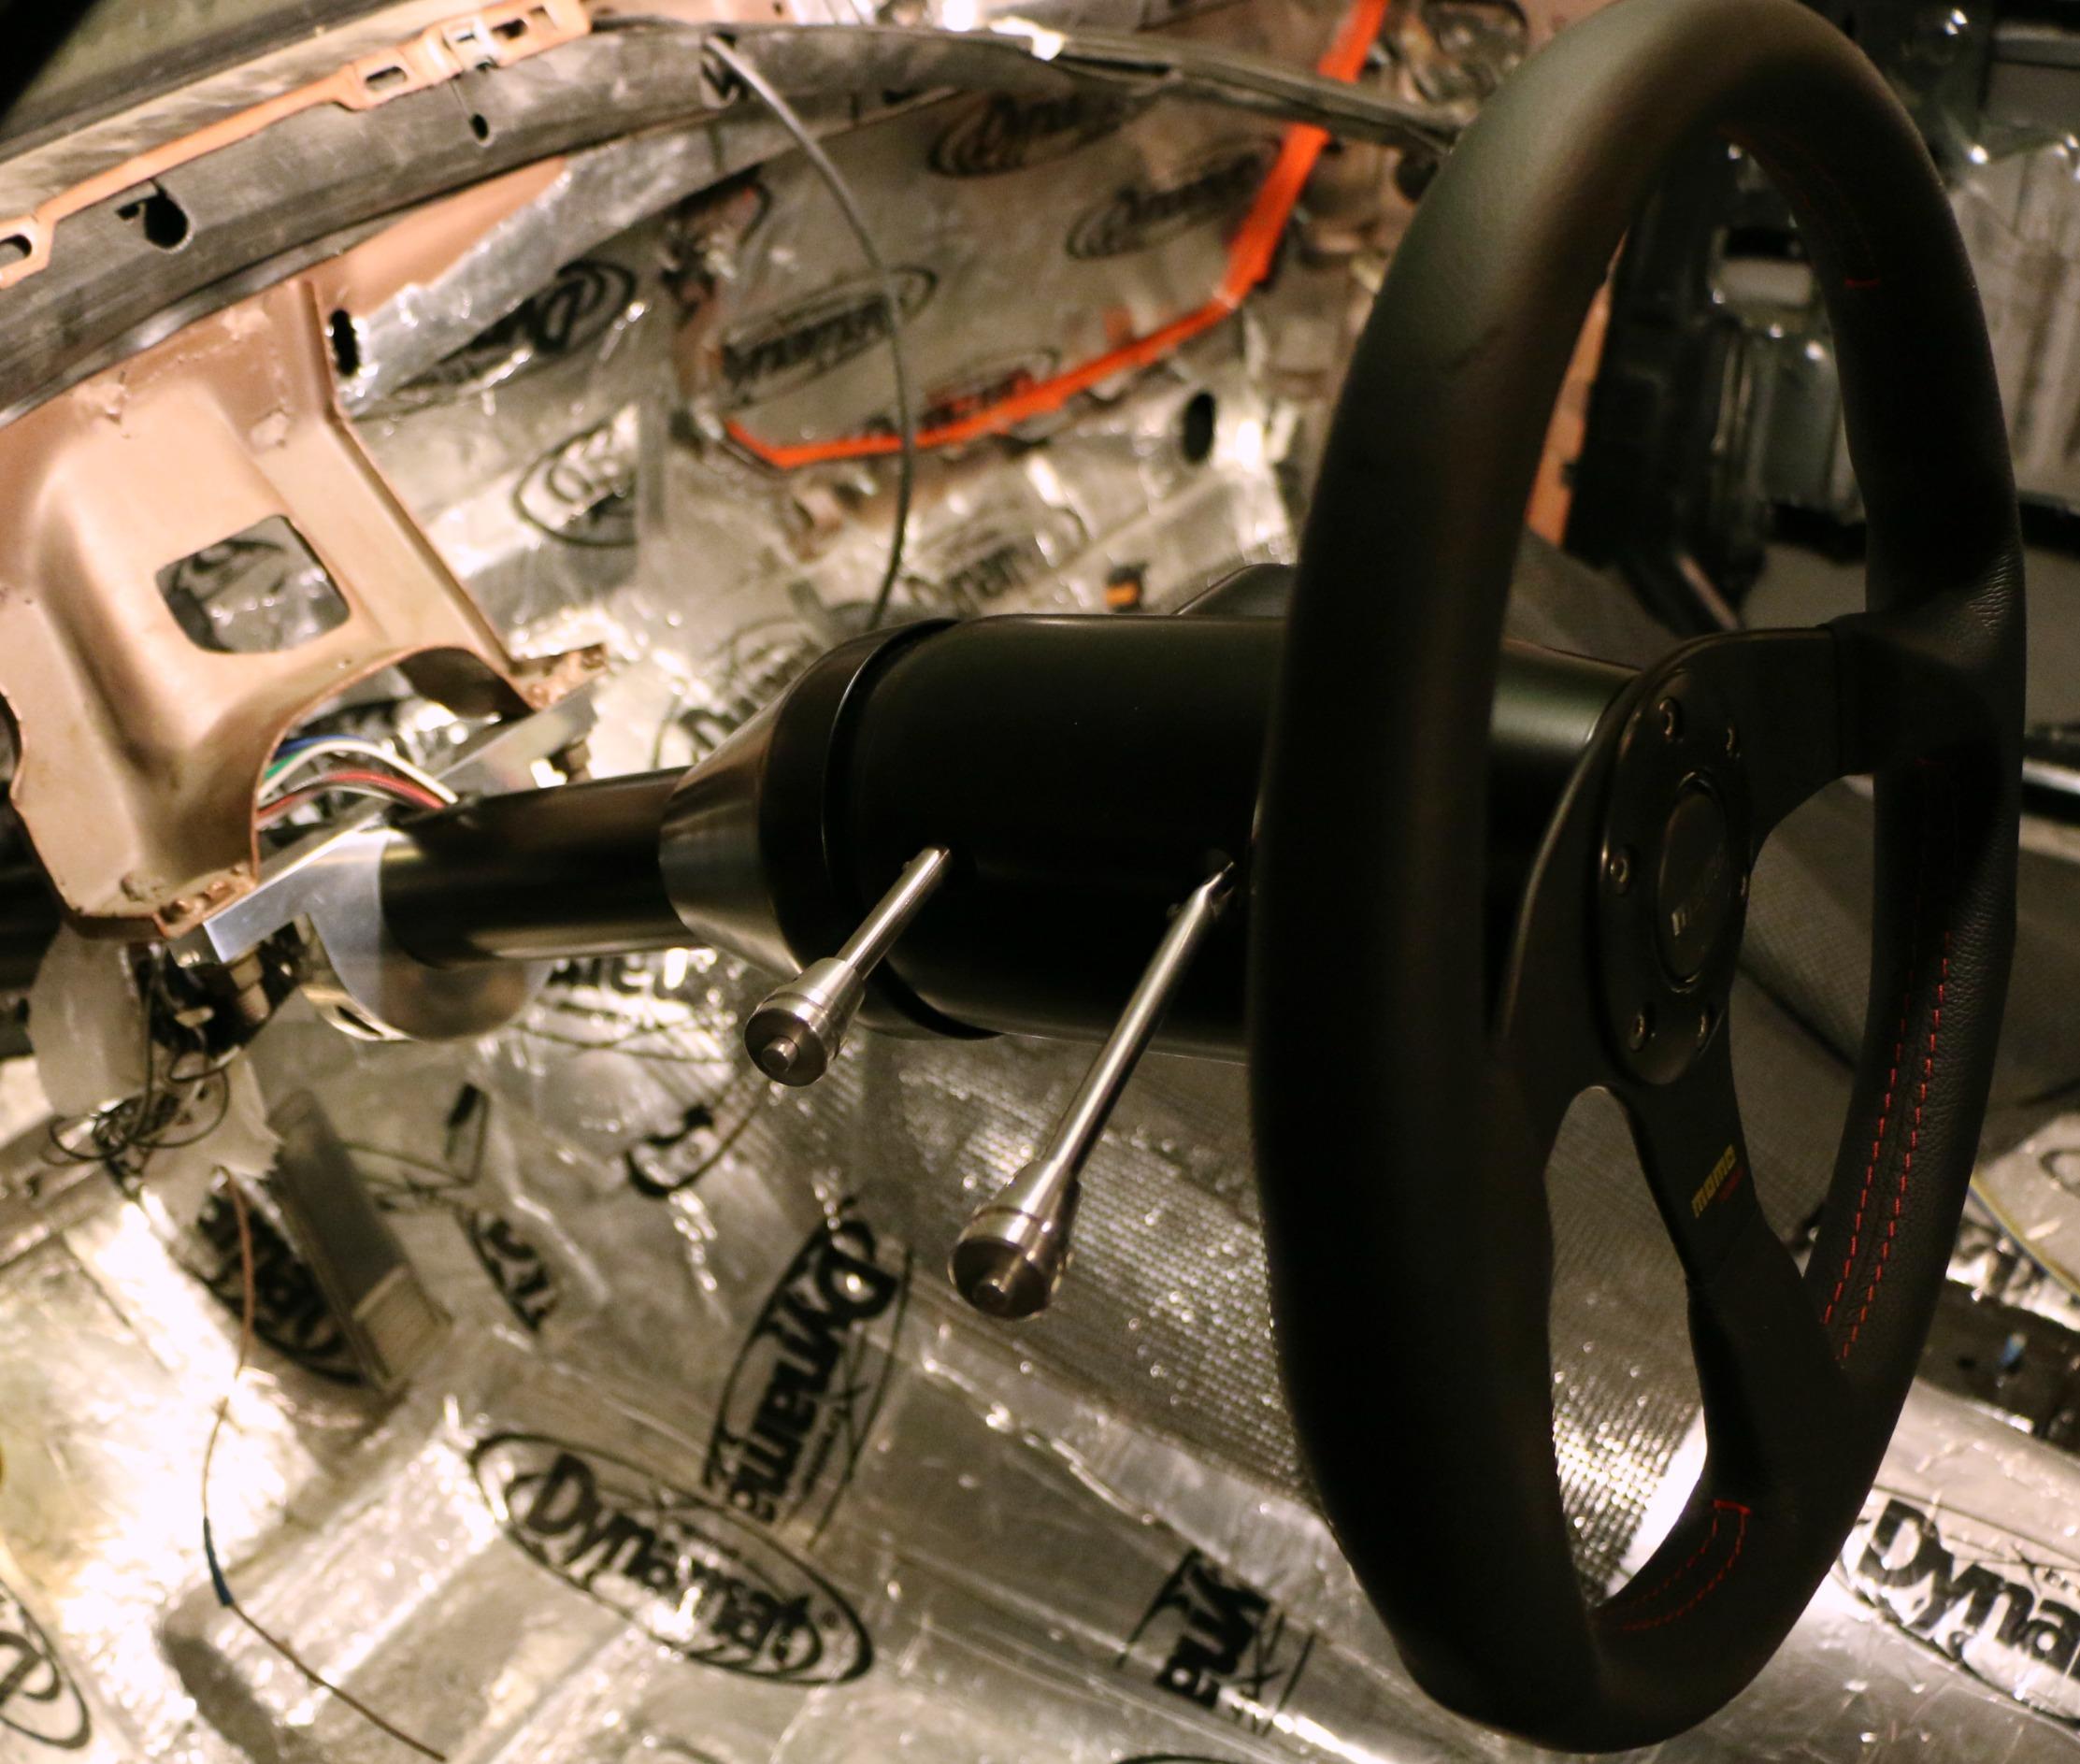 g body steering column wiring diagram surround sound ididit a universal hot rod regal